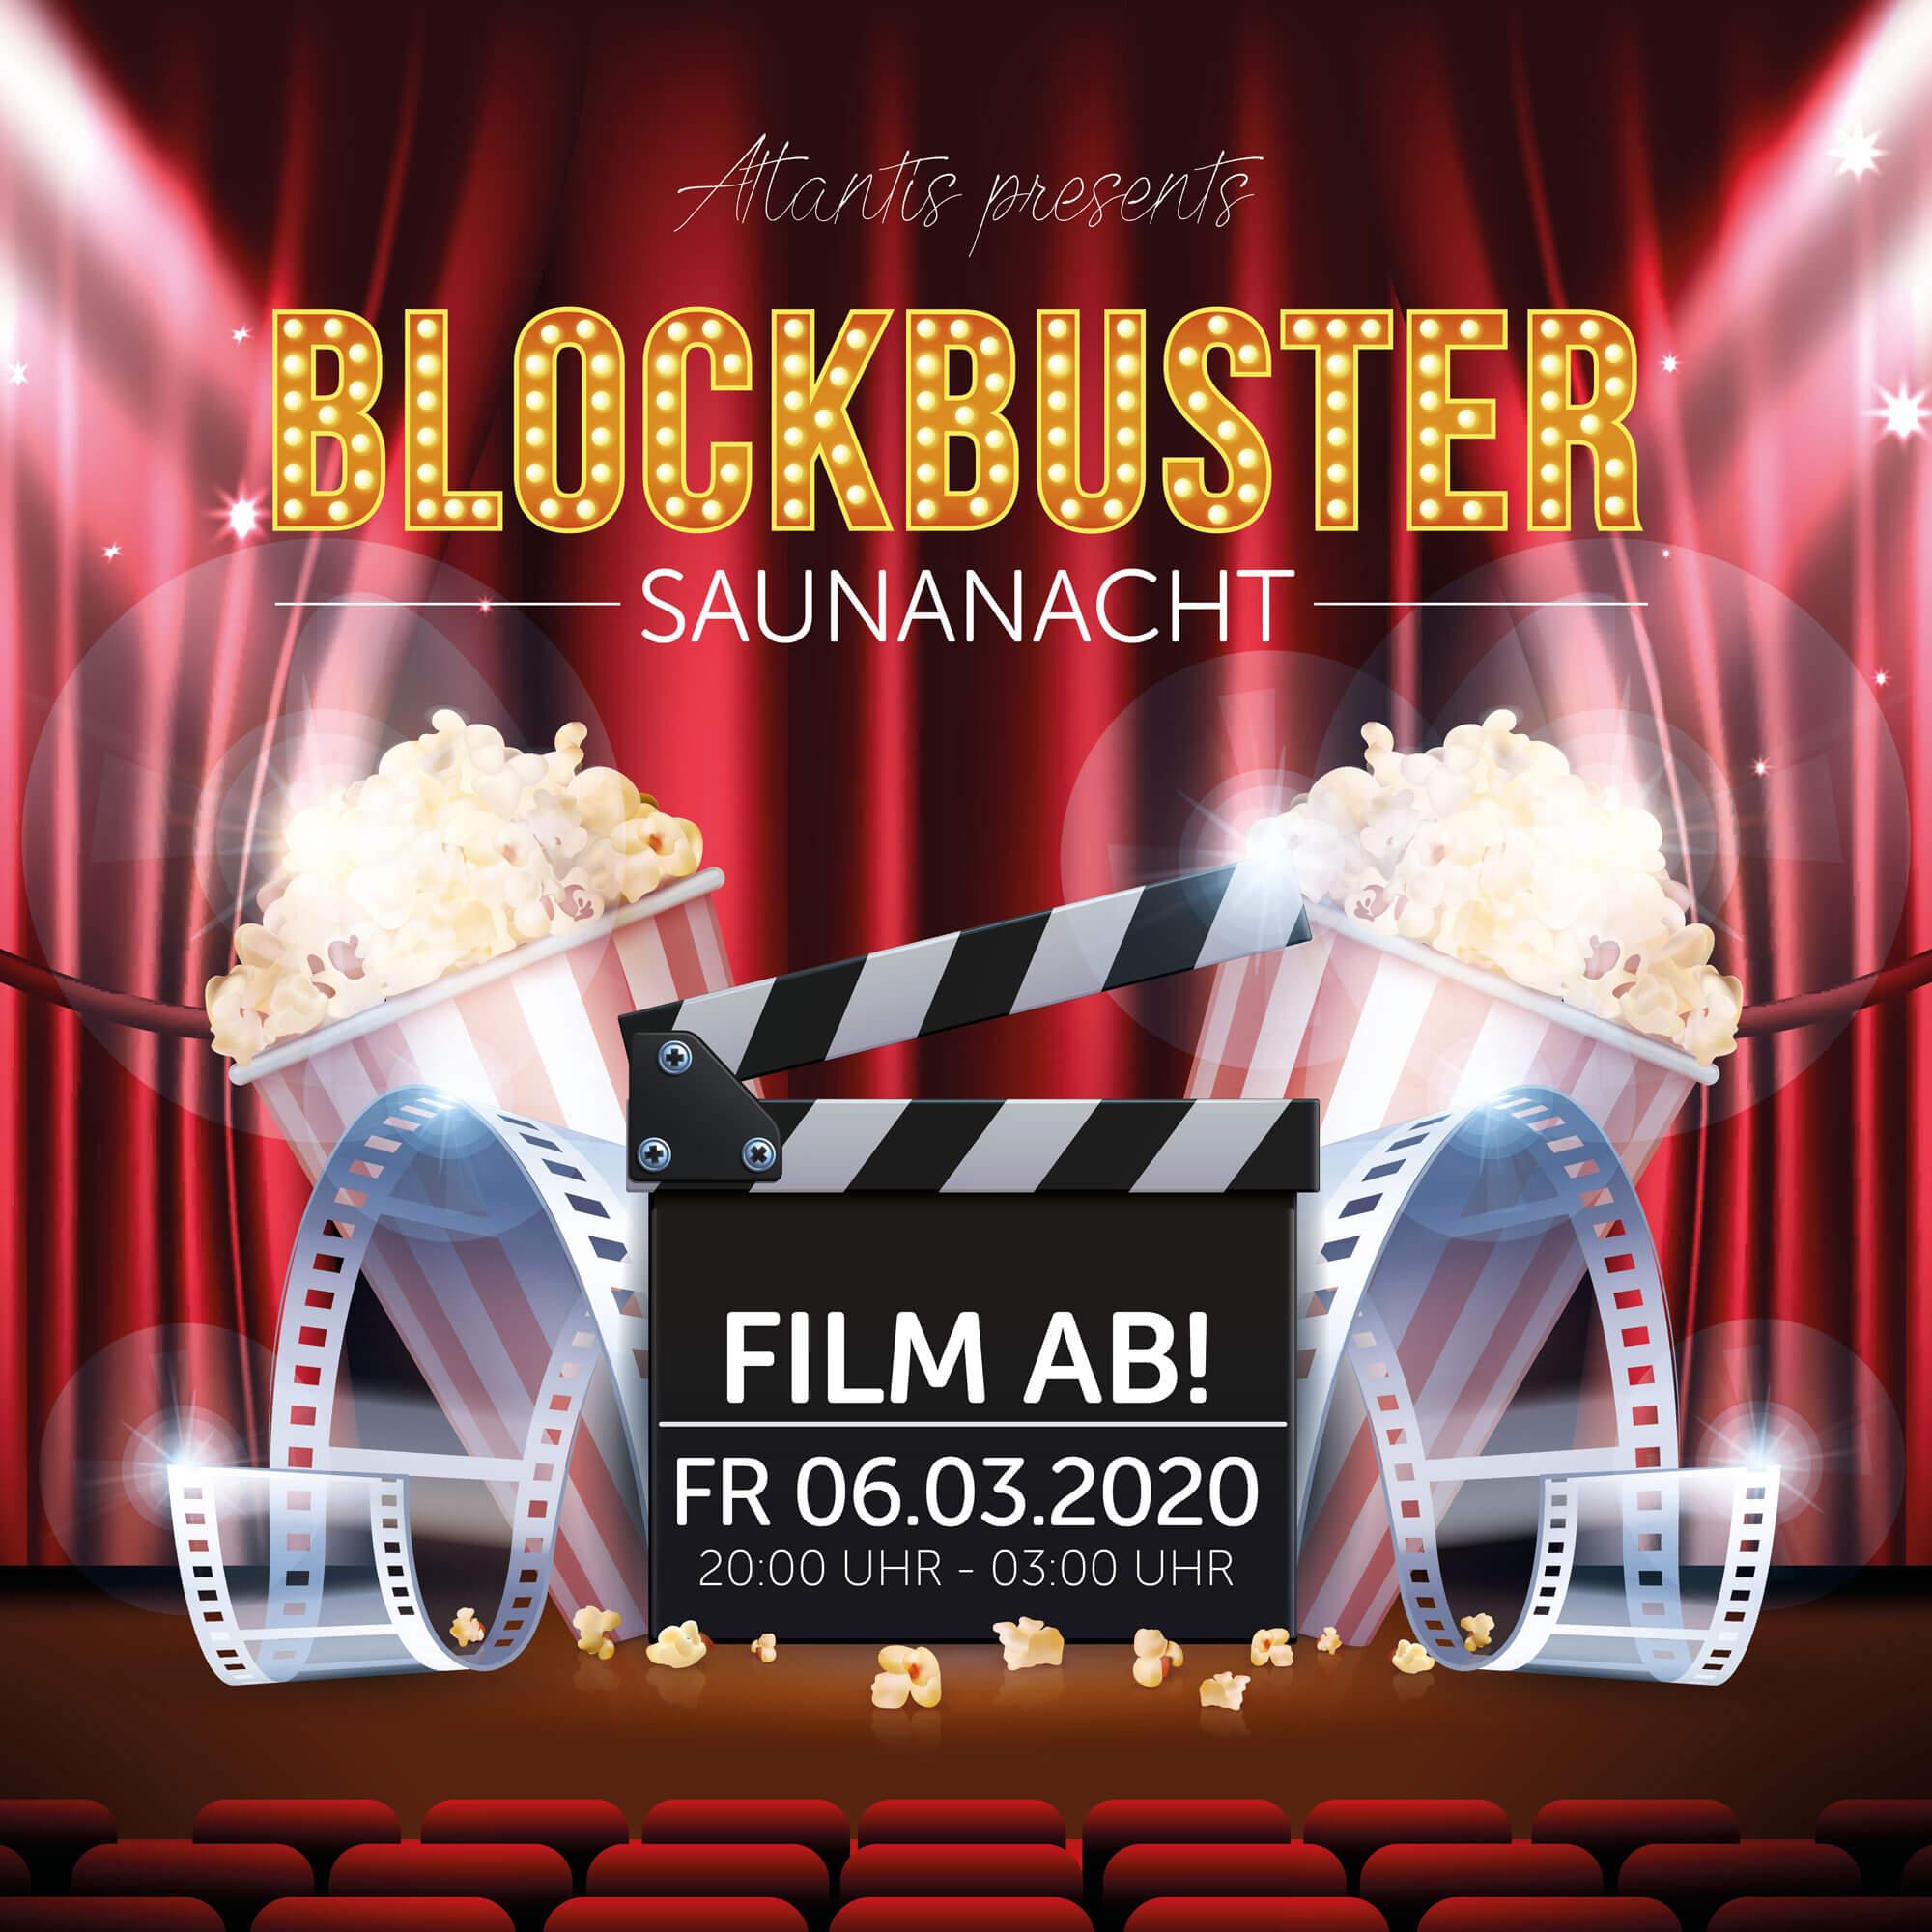 Blokcbuster Saunanacht am 06.03.2020